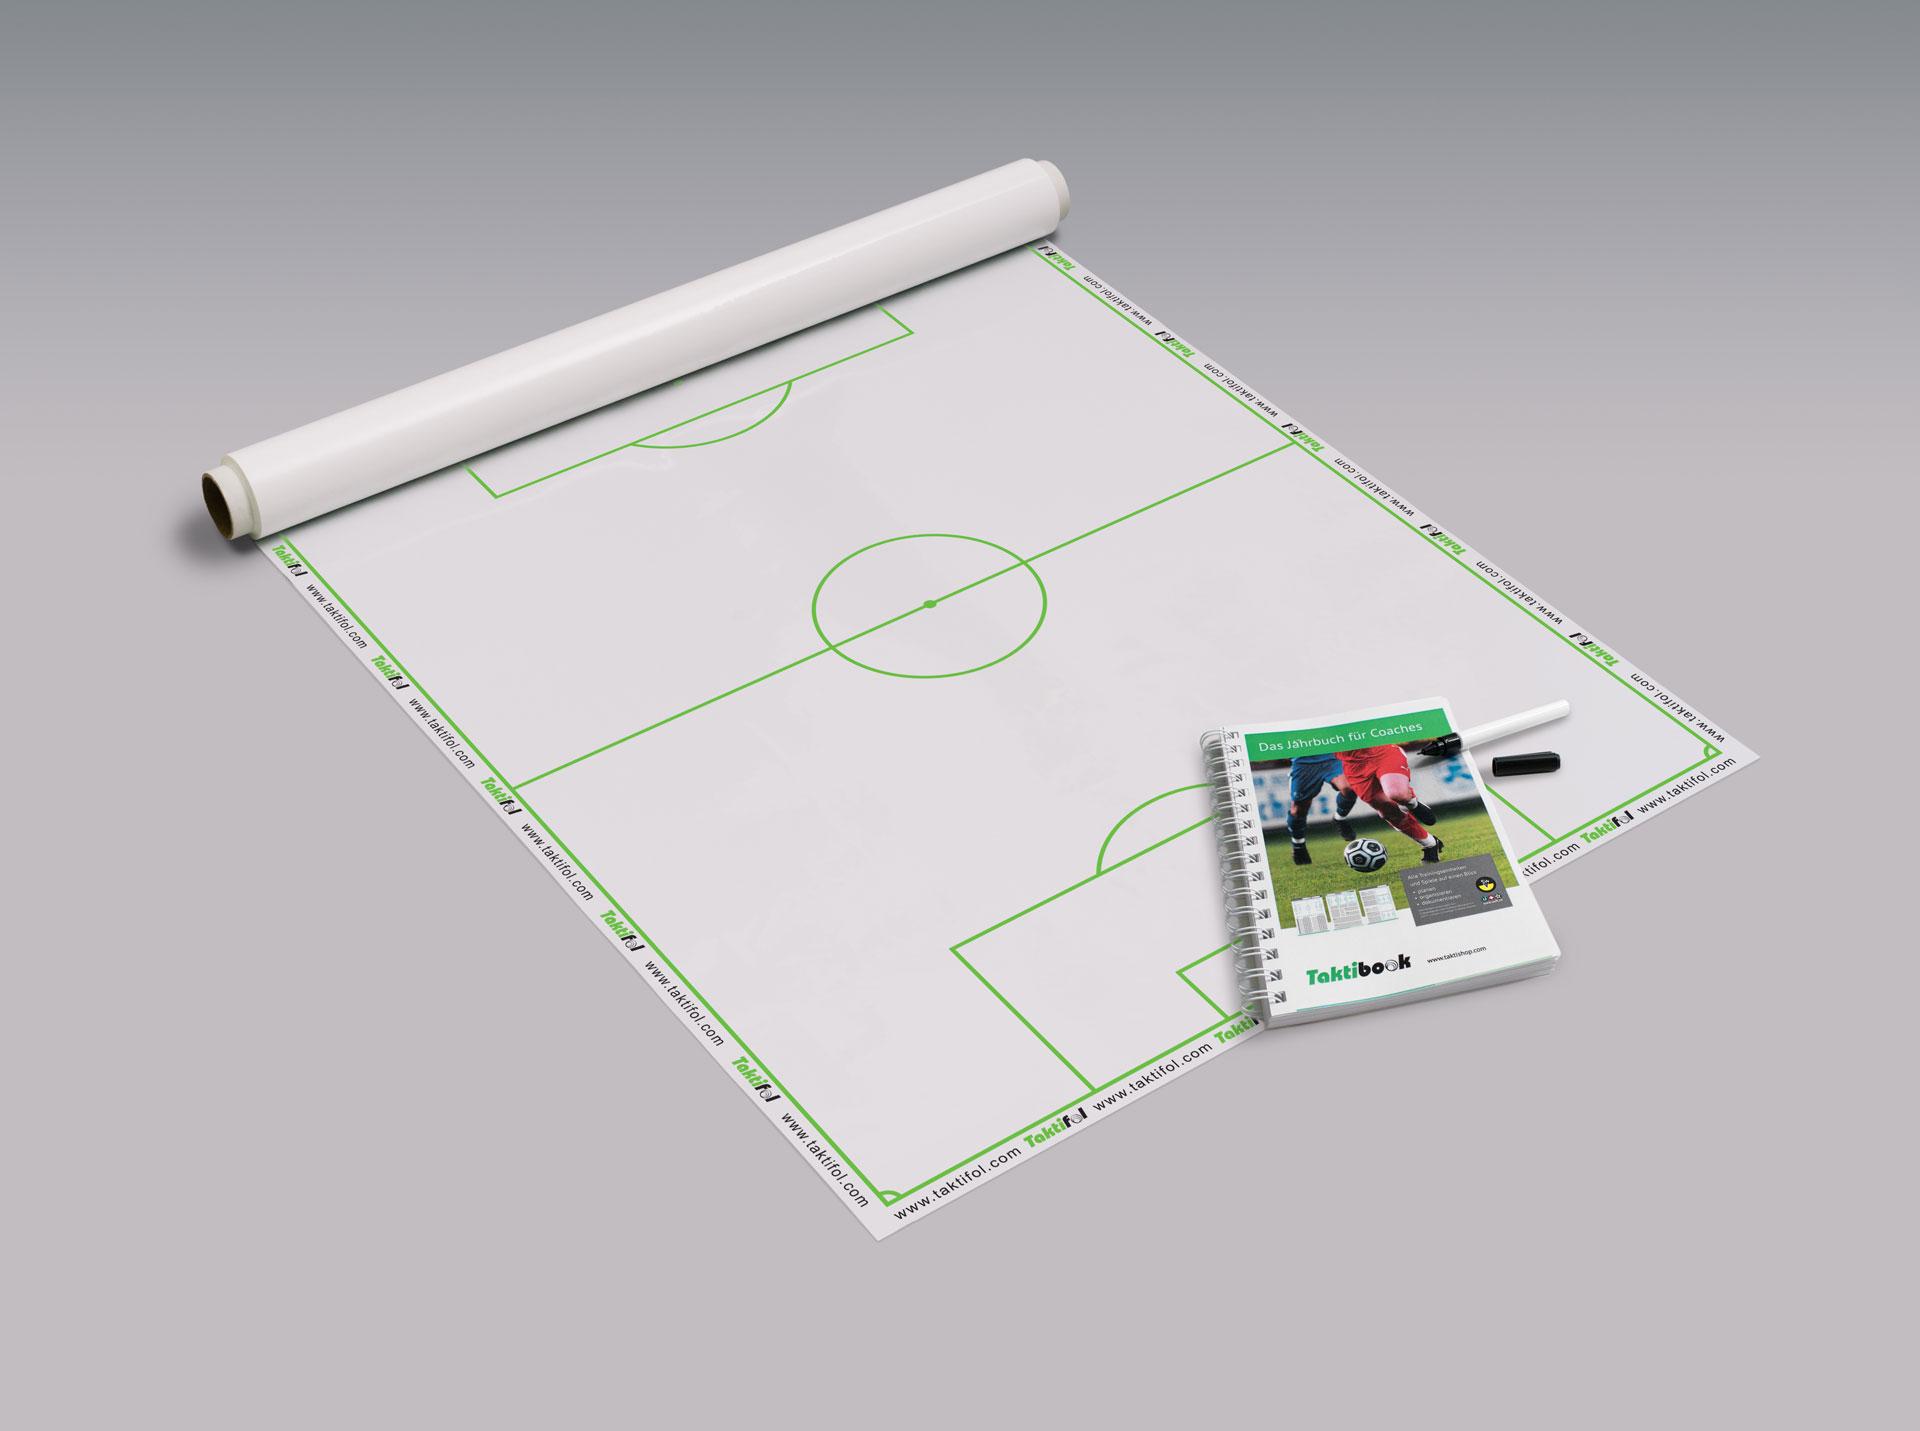 Taktifol Trainerset Soccer